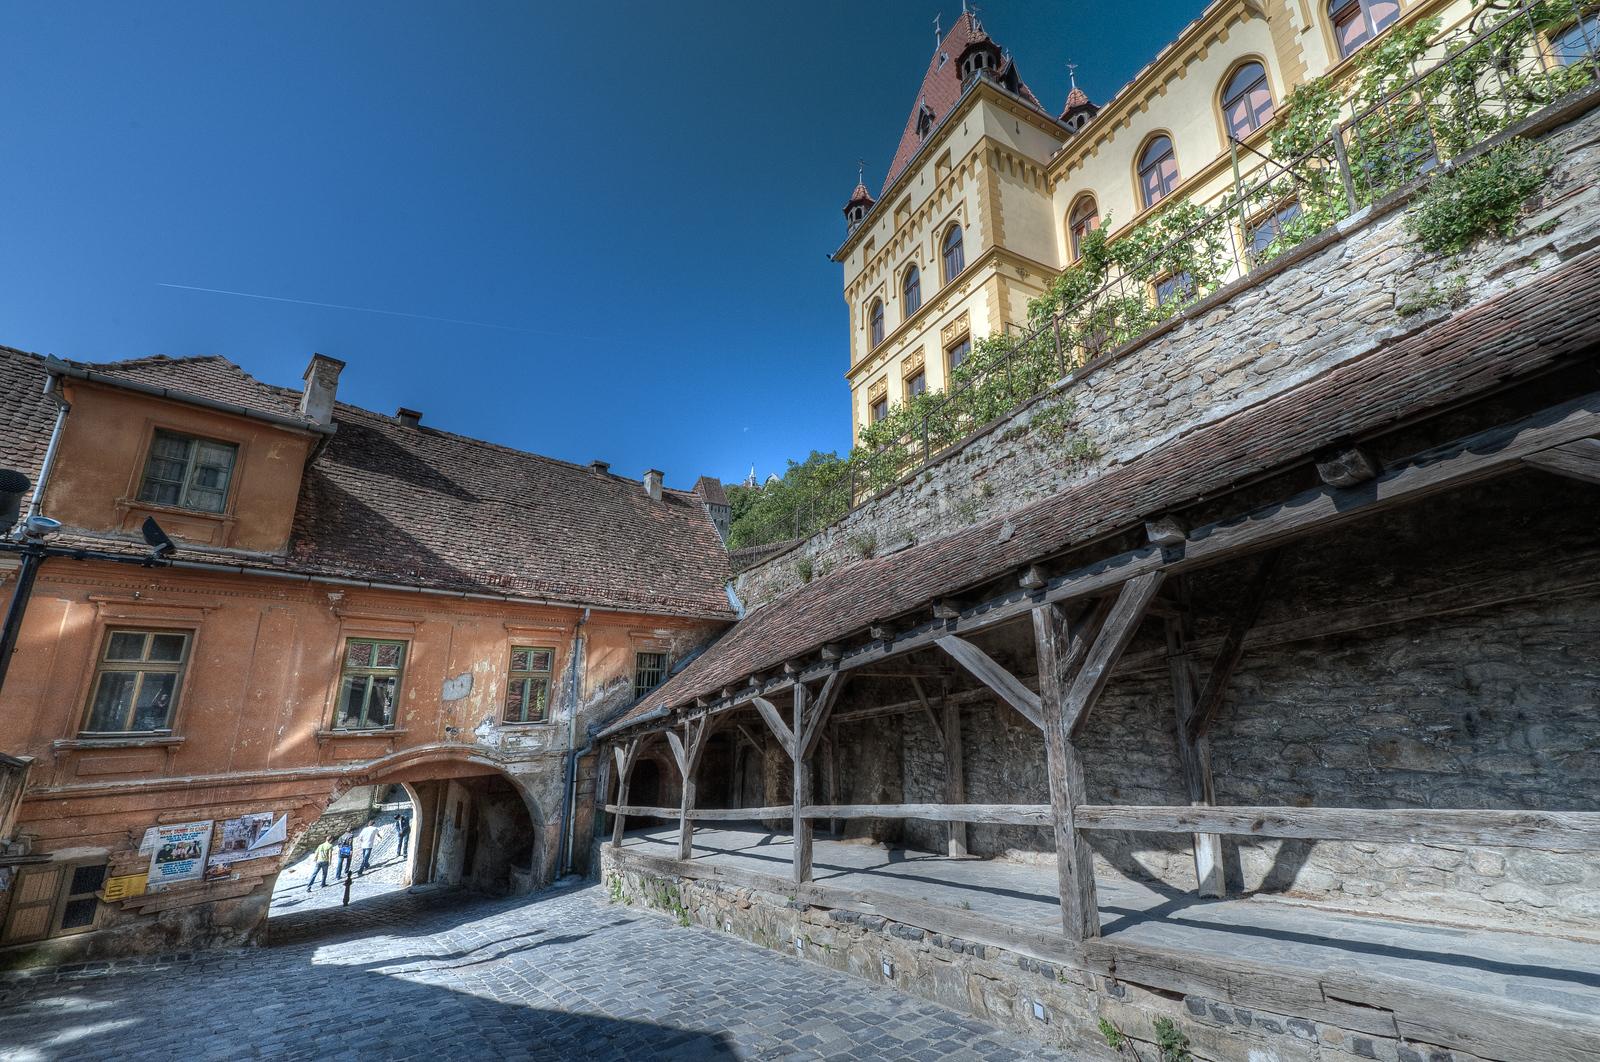 Historic Center of Sighisoara UNESCO World Heritage Site, Romania